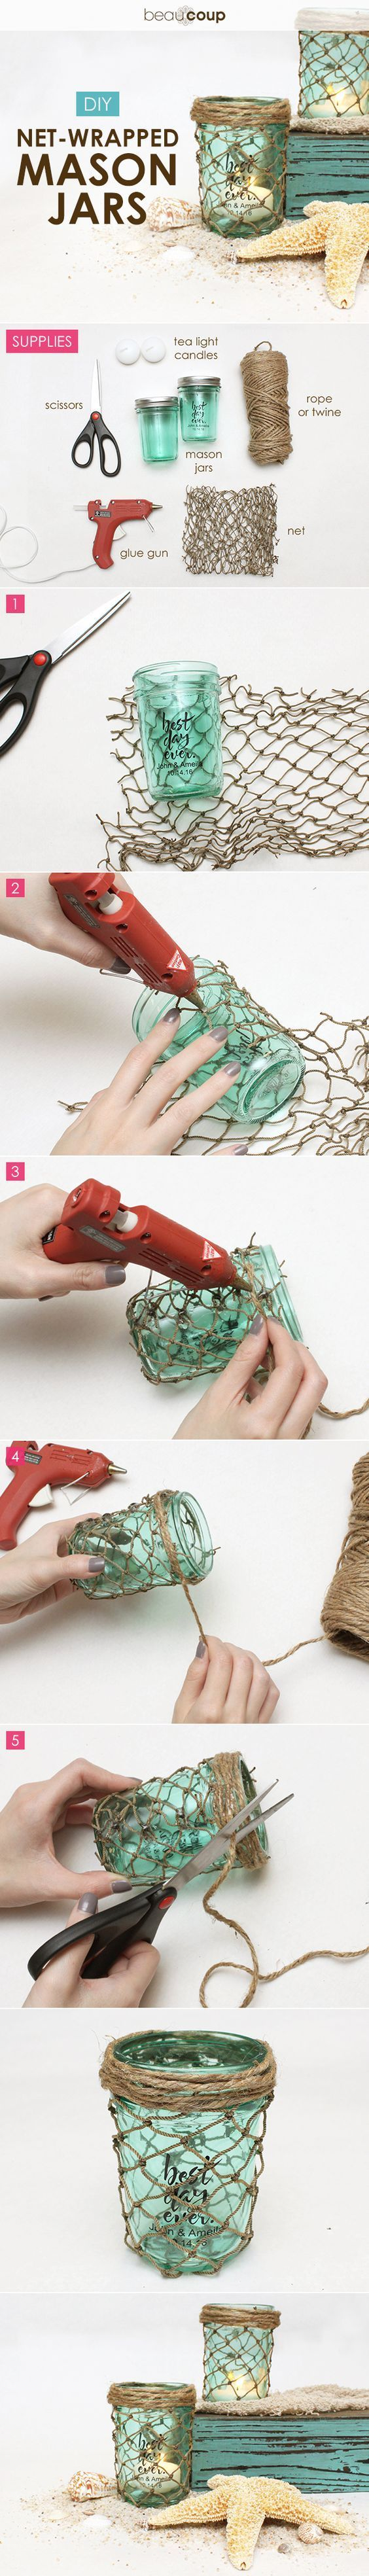 Beach wedding decorations diy  DIY NetWrapped Mason Jars For Easy Beach Themed Decor  Romantic